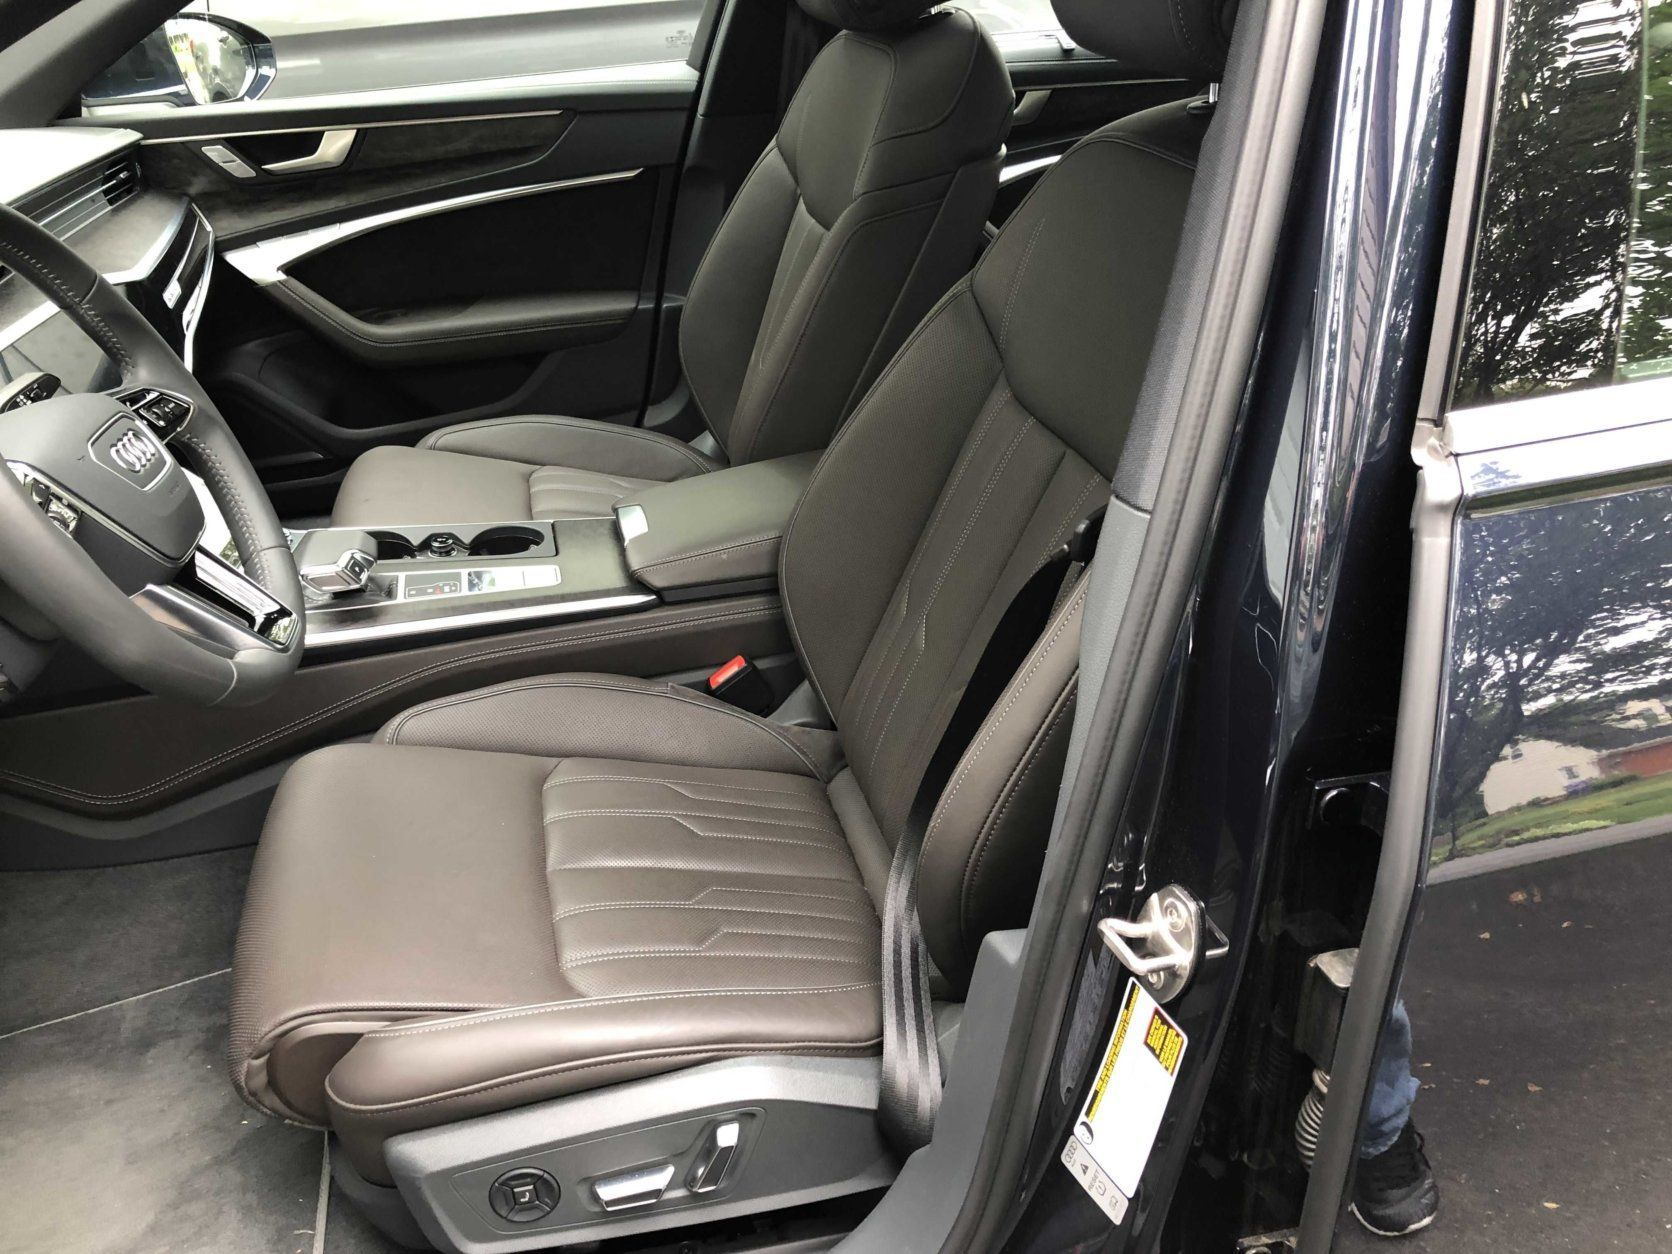 Audi A6 front seats